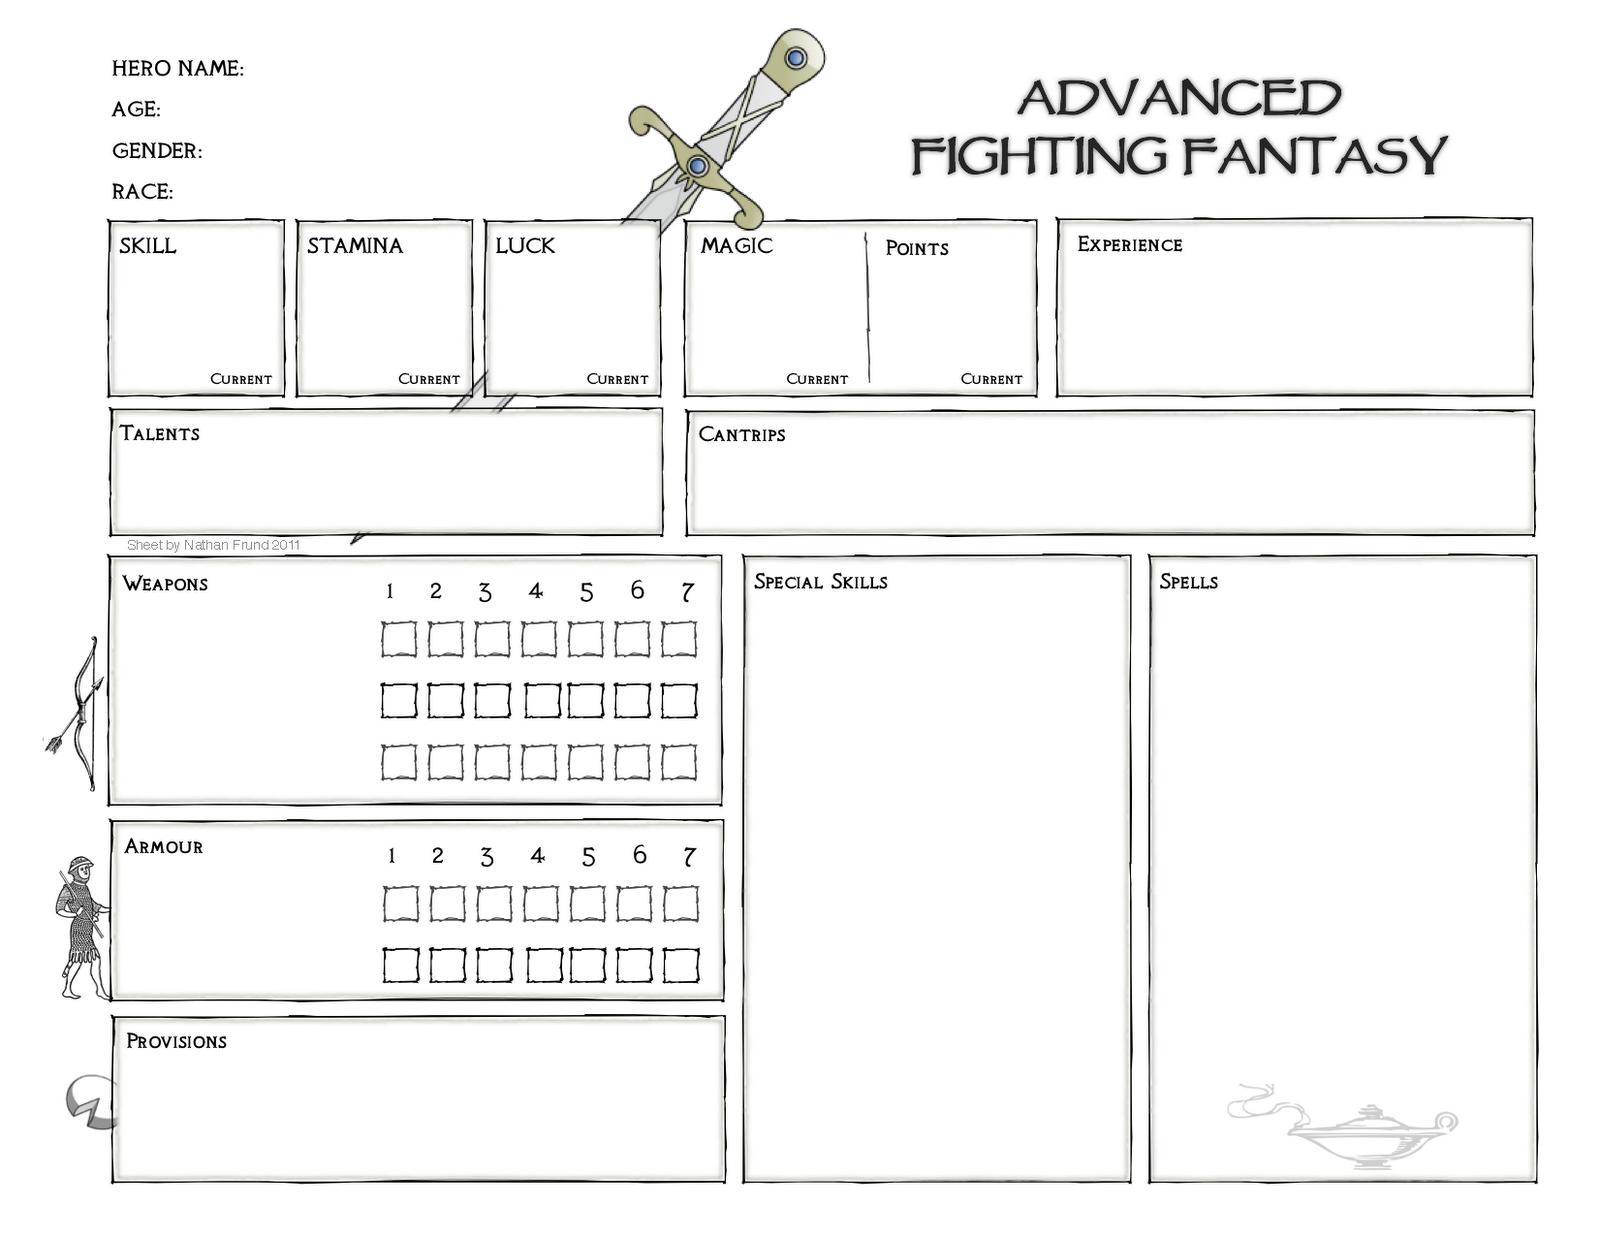 Character Design Pdf Free : Advanced fighting fantasy character sheet platonic solid